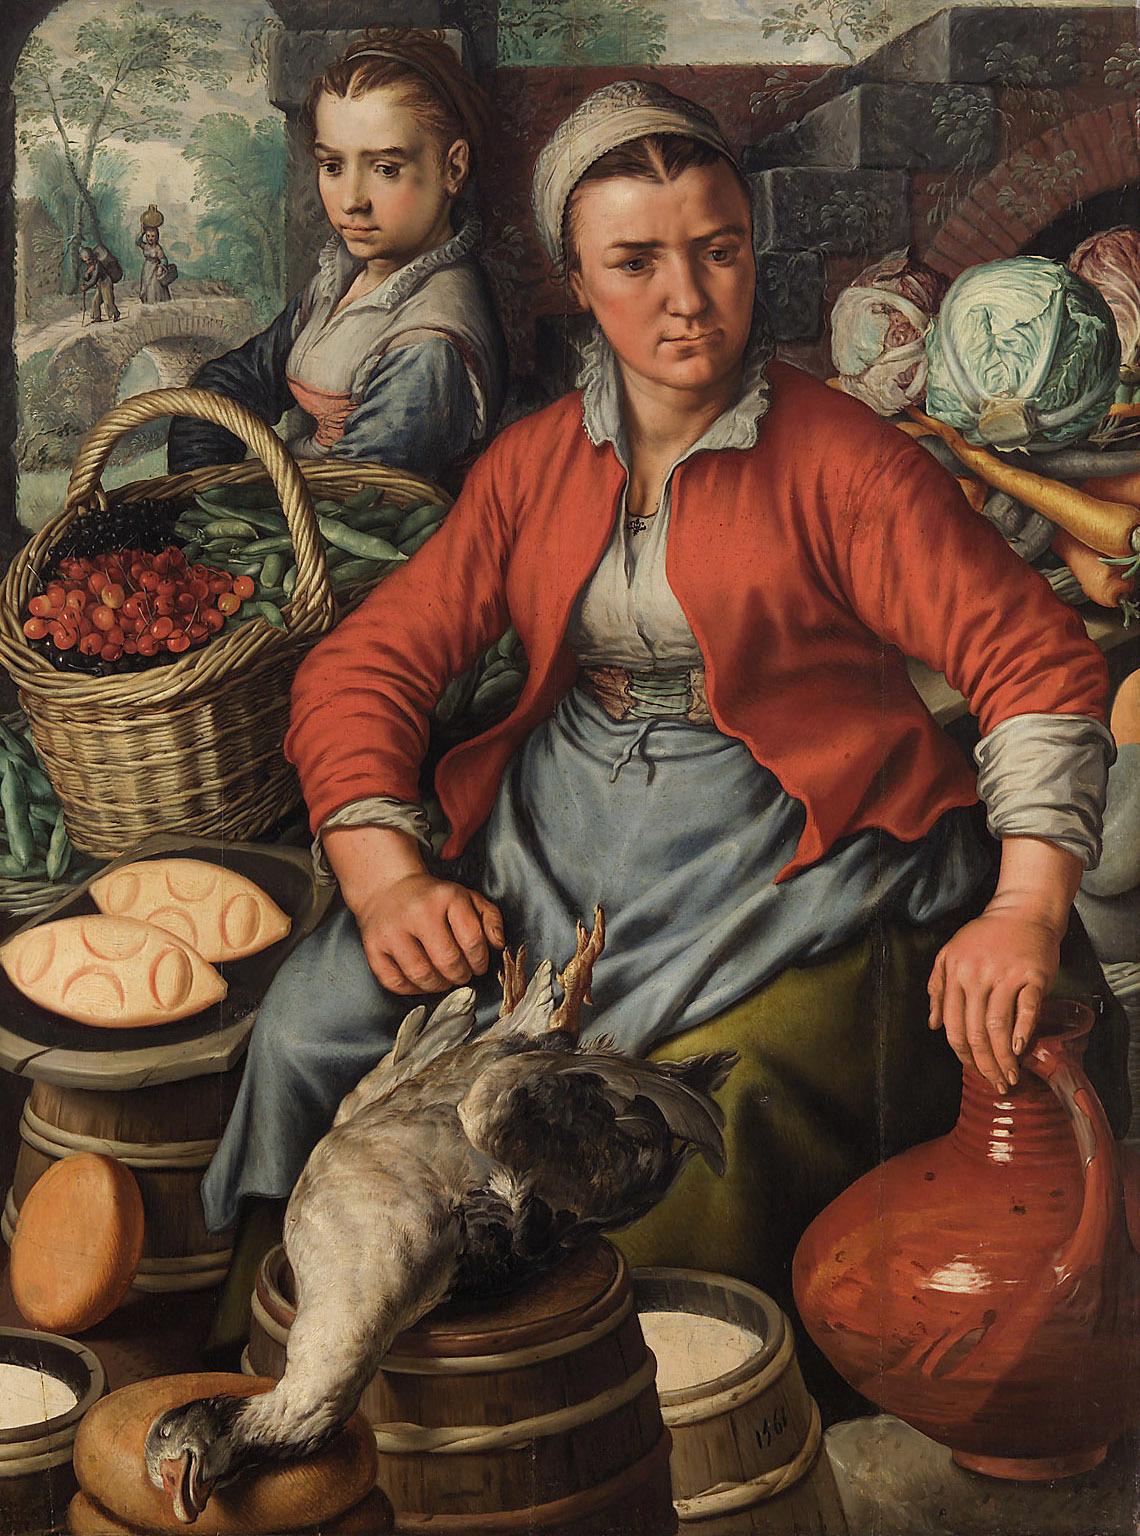 Joachim_Beuckelaer_-_Market_woman.jpg